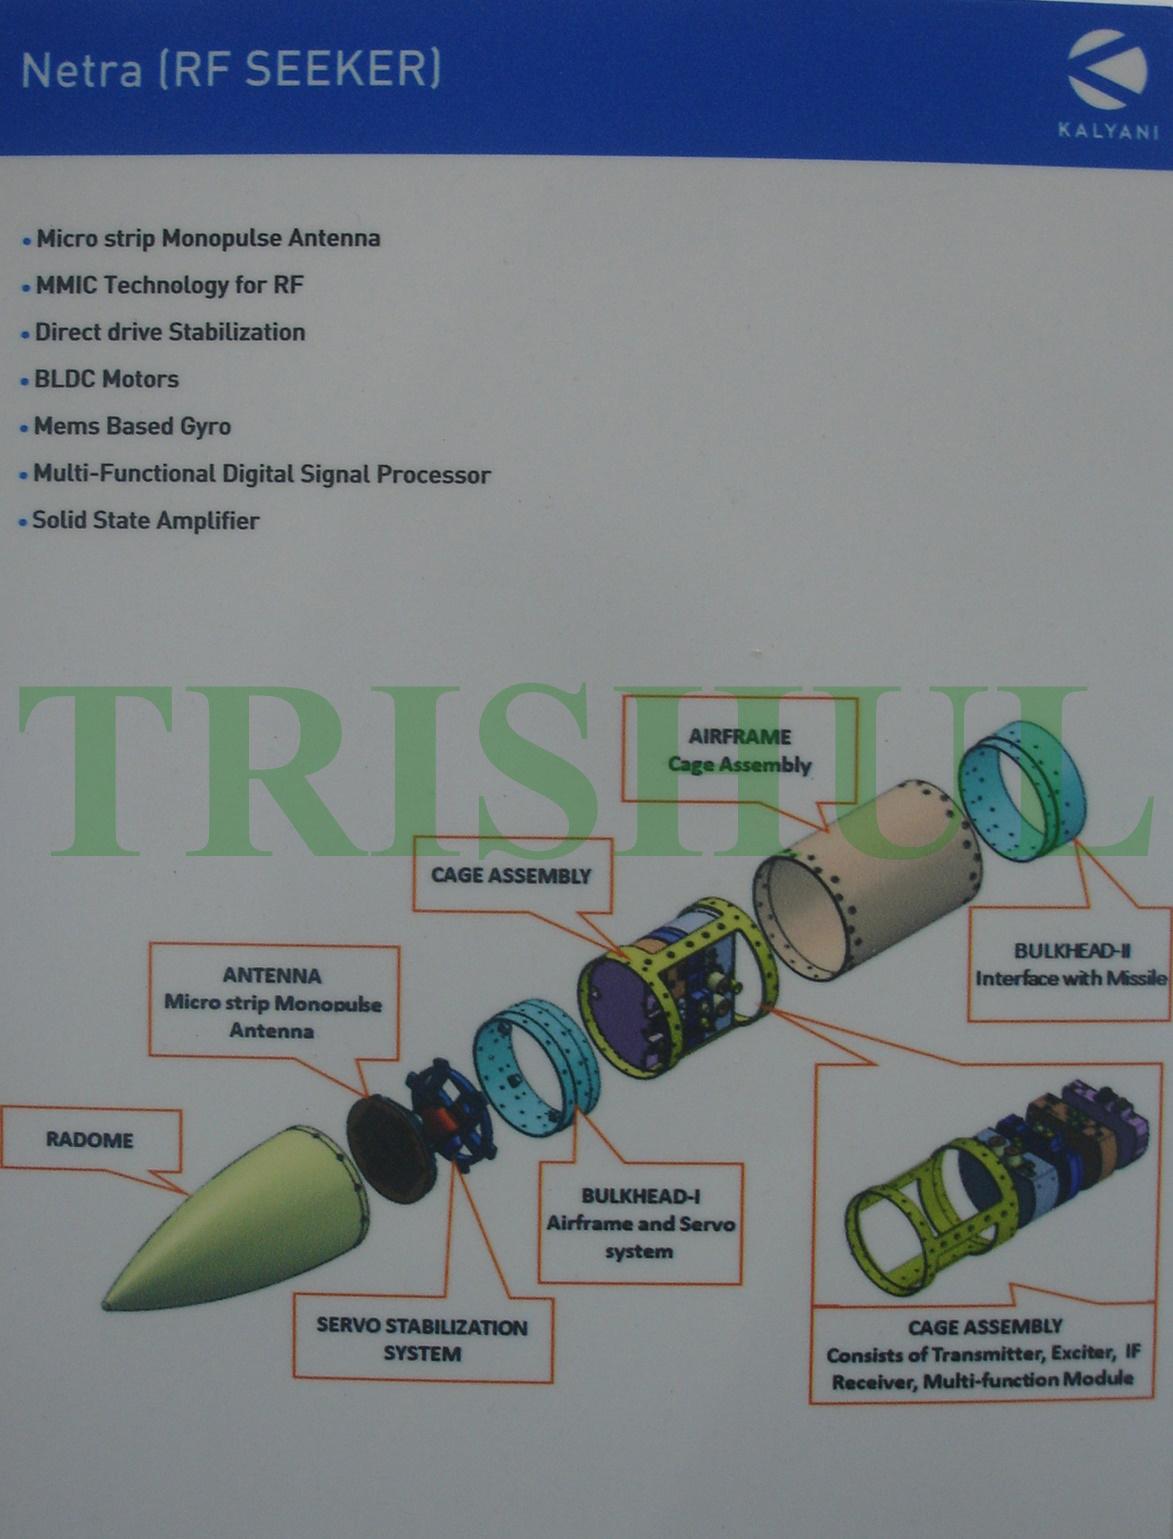 TRISHUL: 'Desi' Active RF Seeker For Astra-1 & Astra-2 BVRAAMs, QR